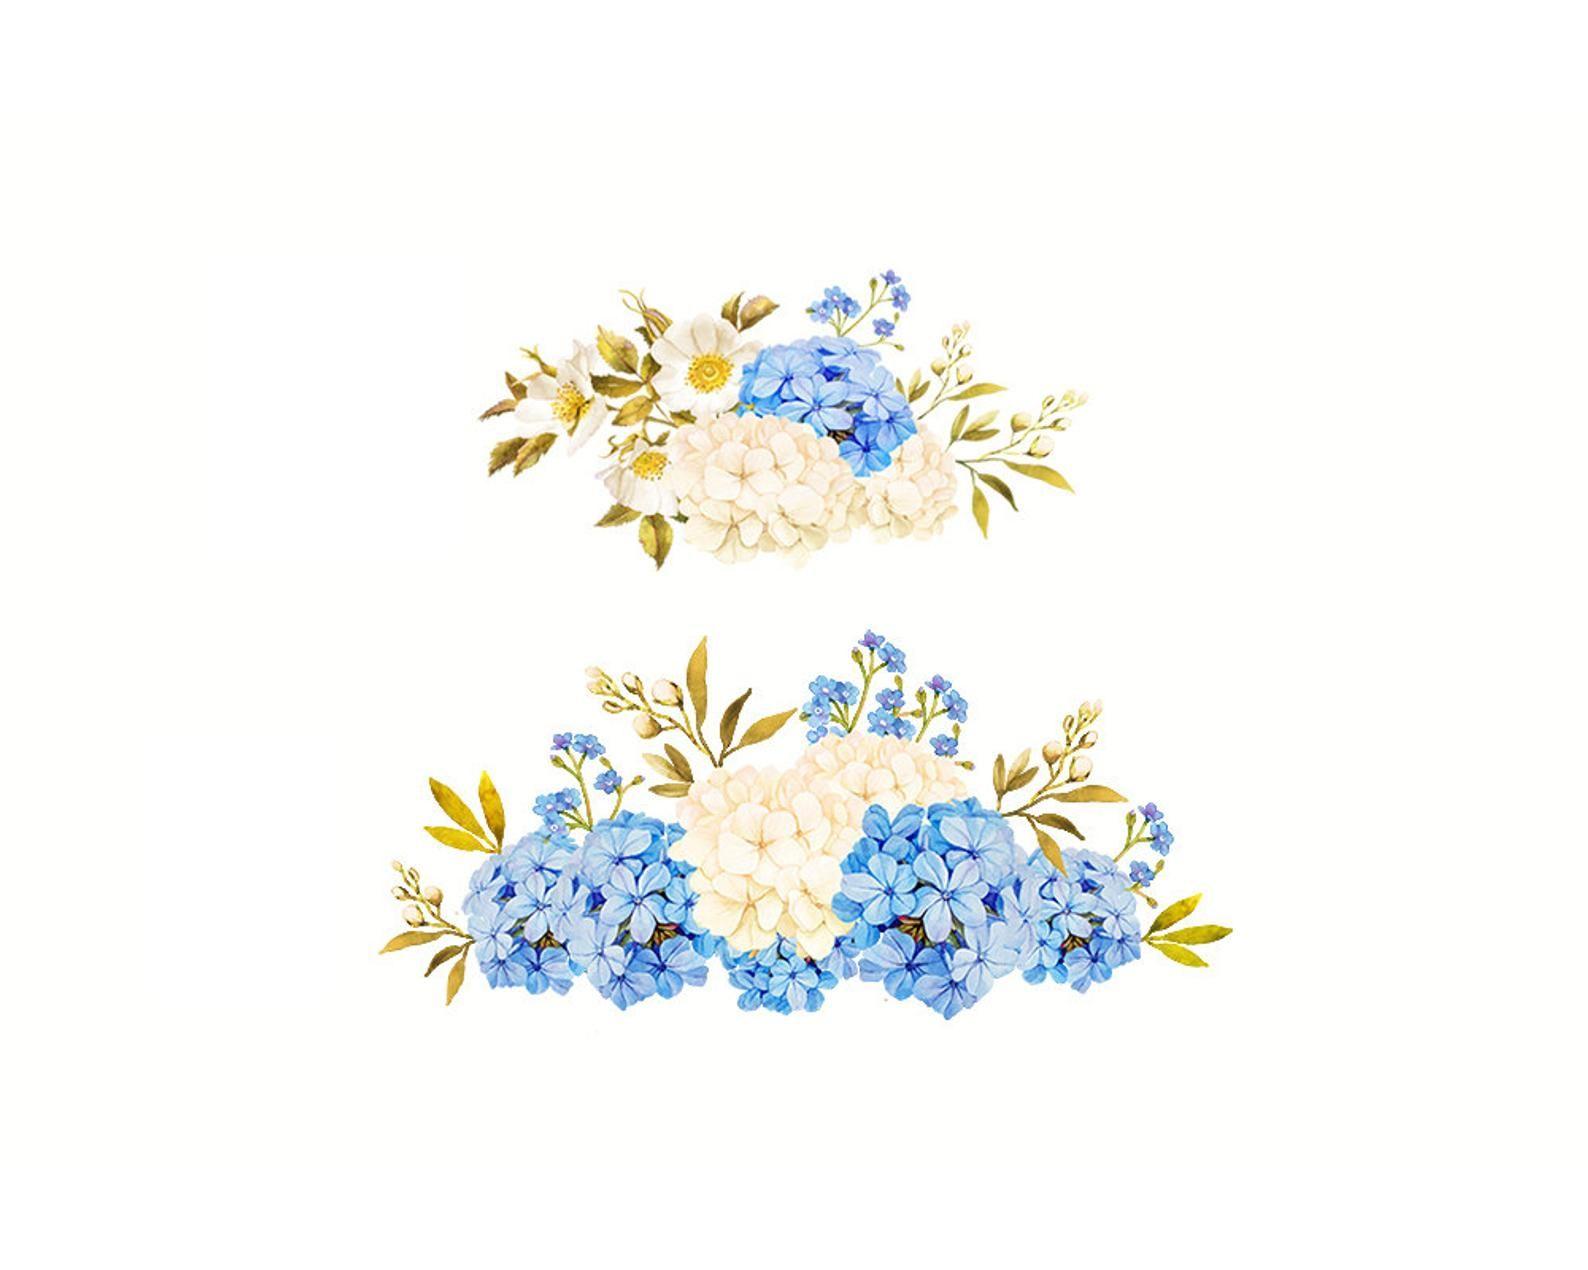 Flower Watercolor Clipart Floral Clipart Blue Jasmine Clipart